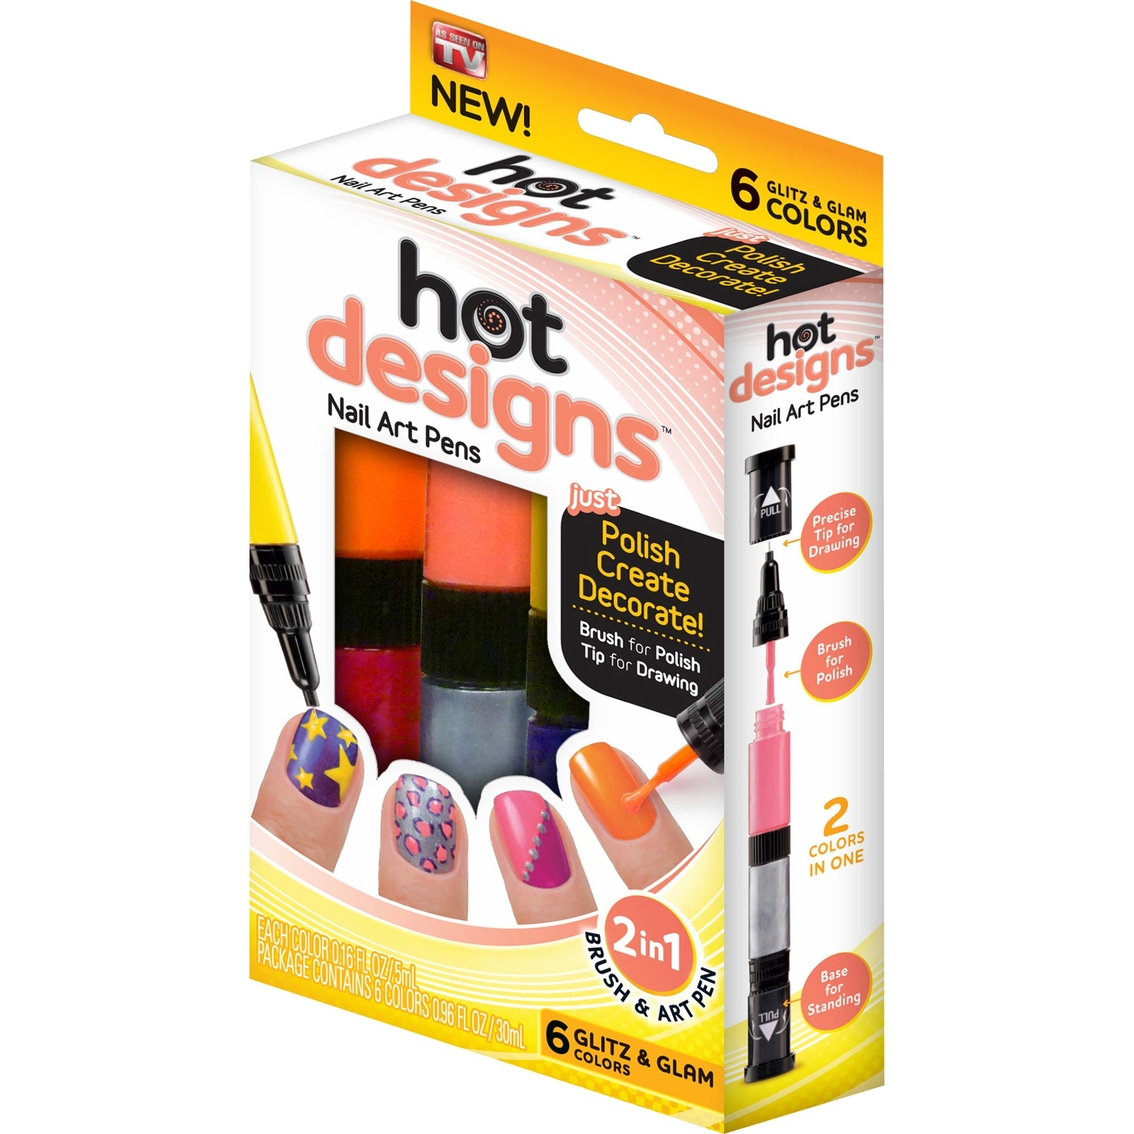 As Seen On Tv Hot Designs Nail Art Pen Glitz And Glam | Nails & Art ...